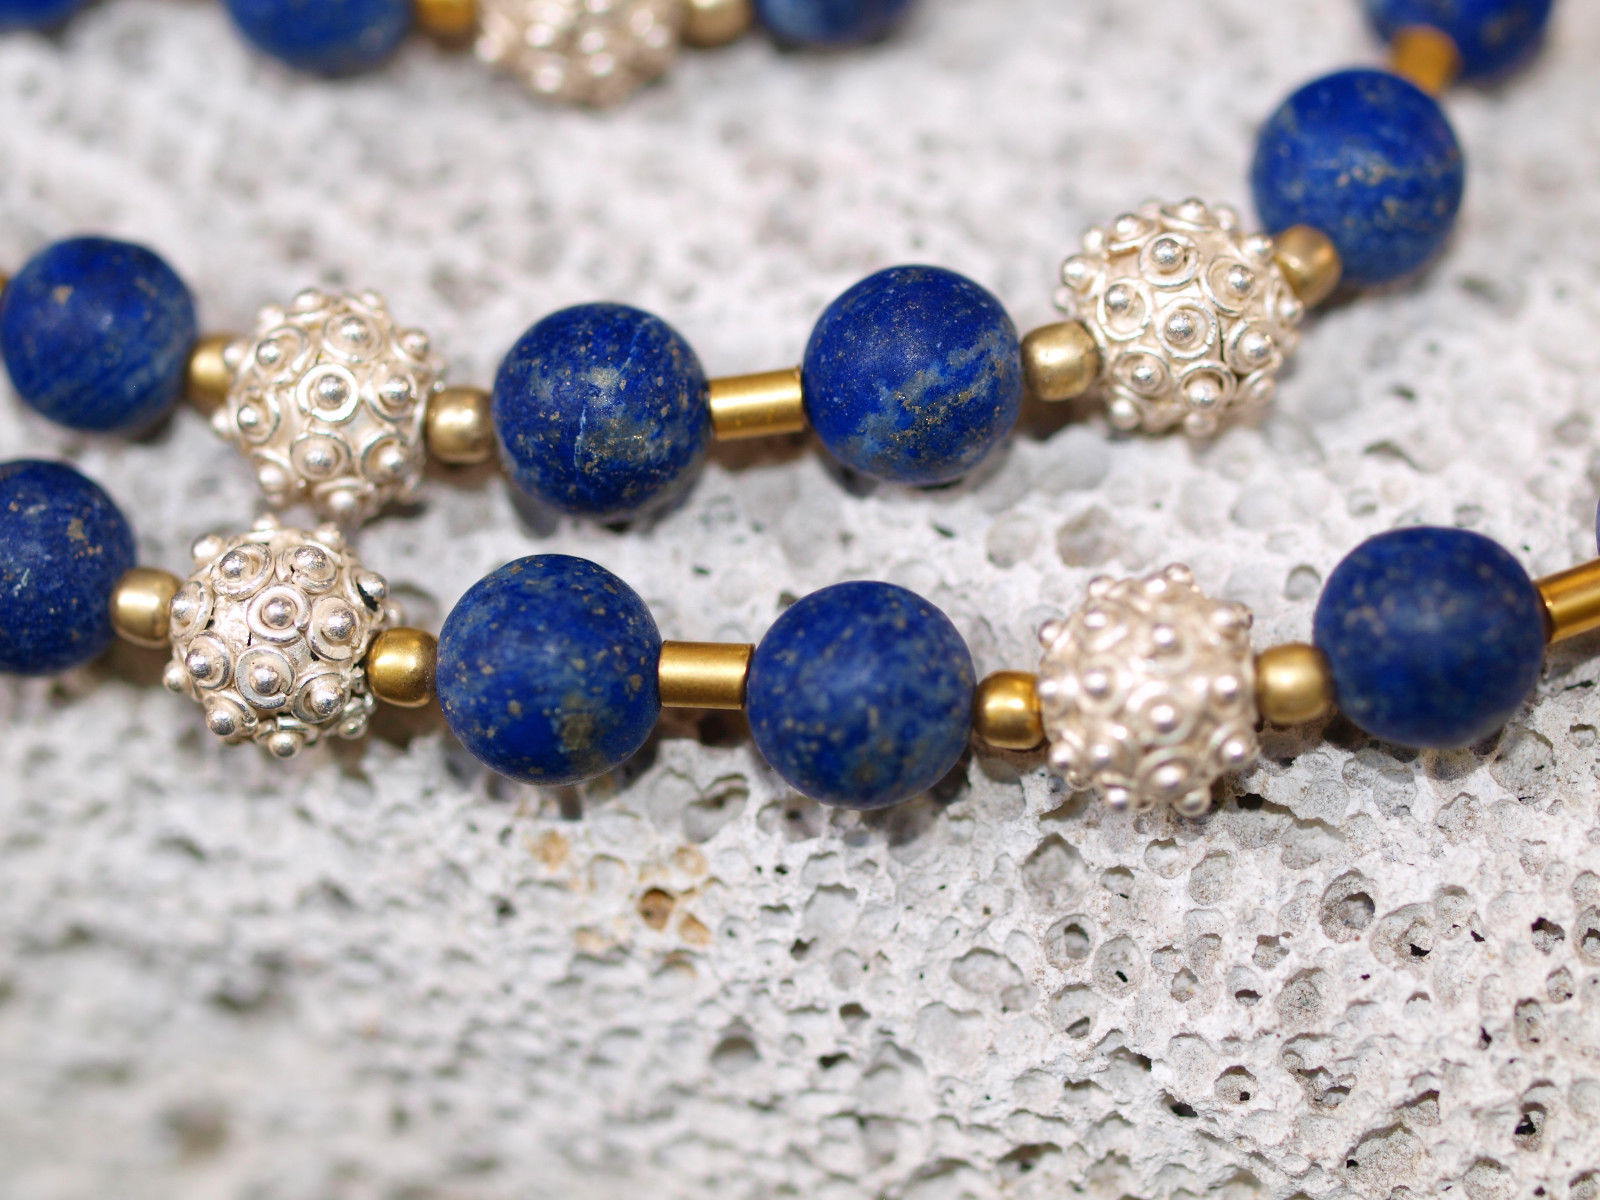 Unikat Kette Silber 925 tlw. vergoldet Lapis Lazuli Kugeln granuliert